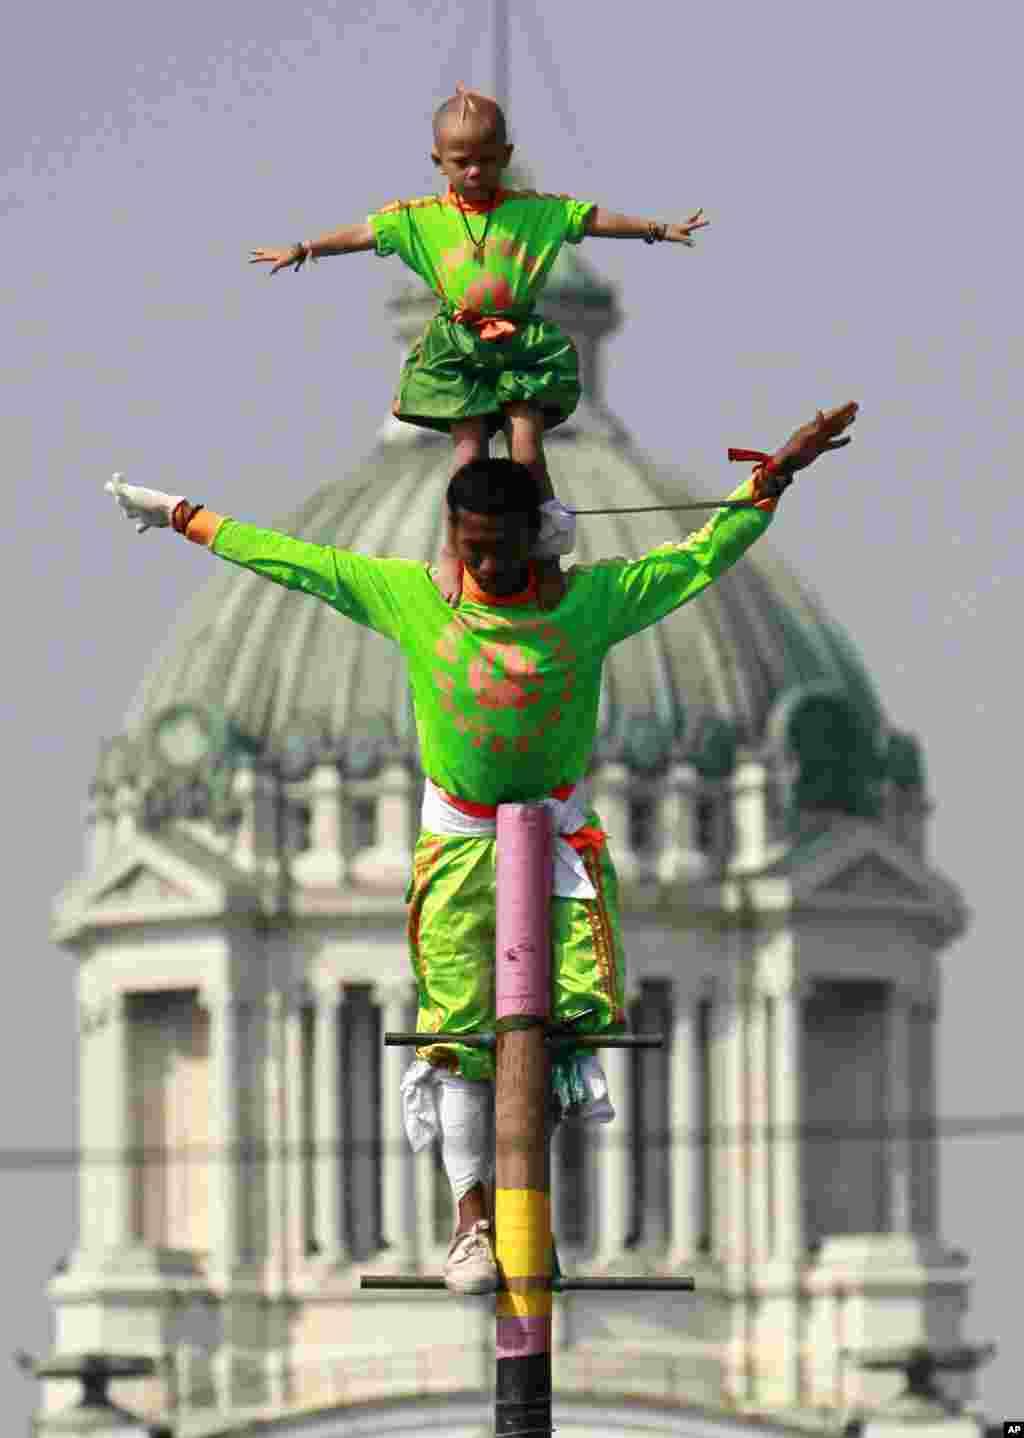 Dua anak laki-laki Thailand melakukan pertunjukan akrobat untuk menghibur para demonstran anti-pemerintah di kawasan Royal Plaza, Bangkok, Thailand.